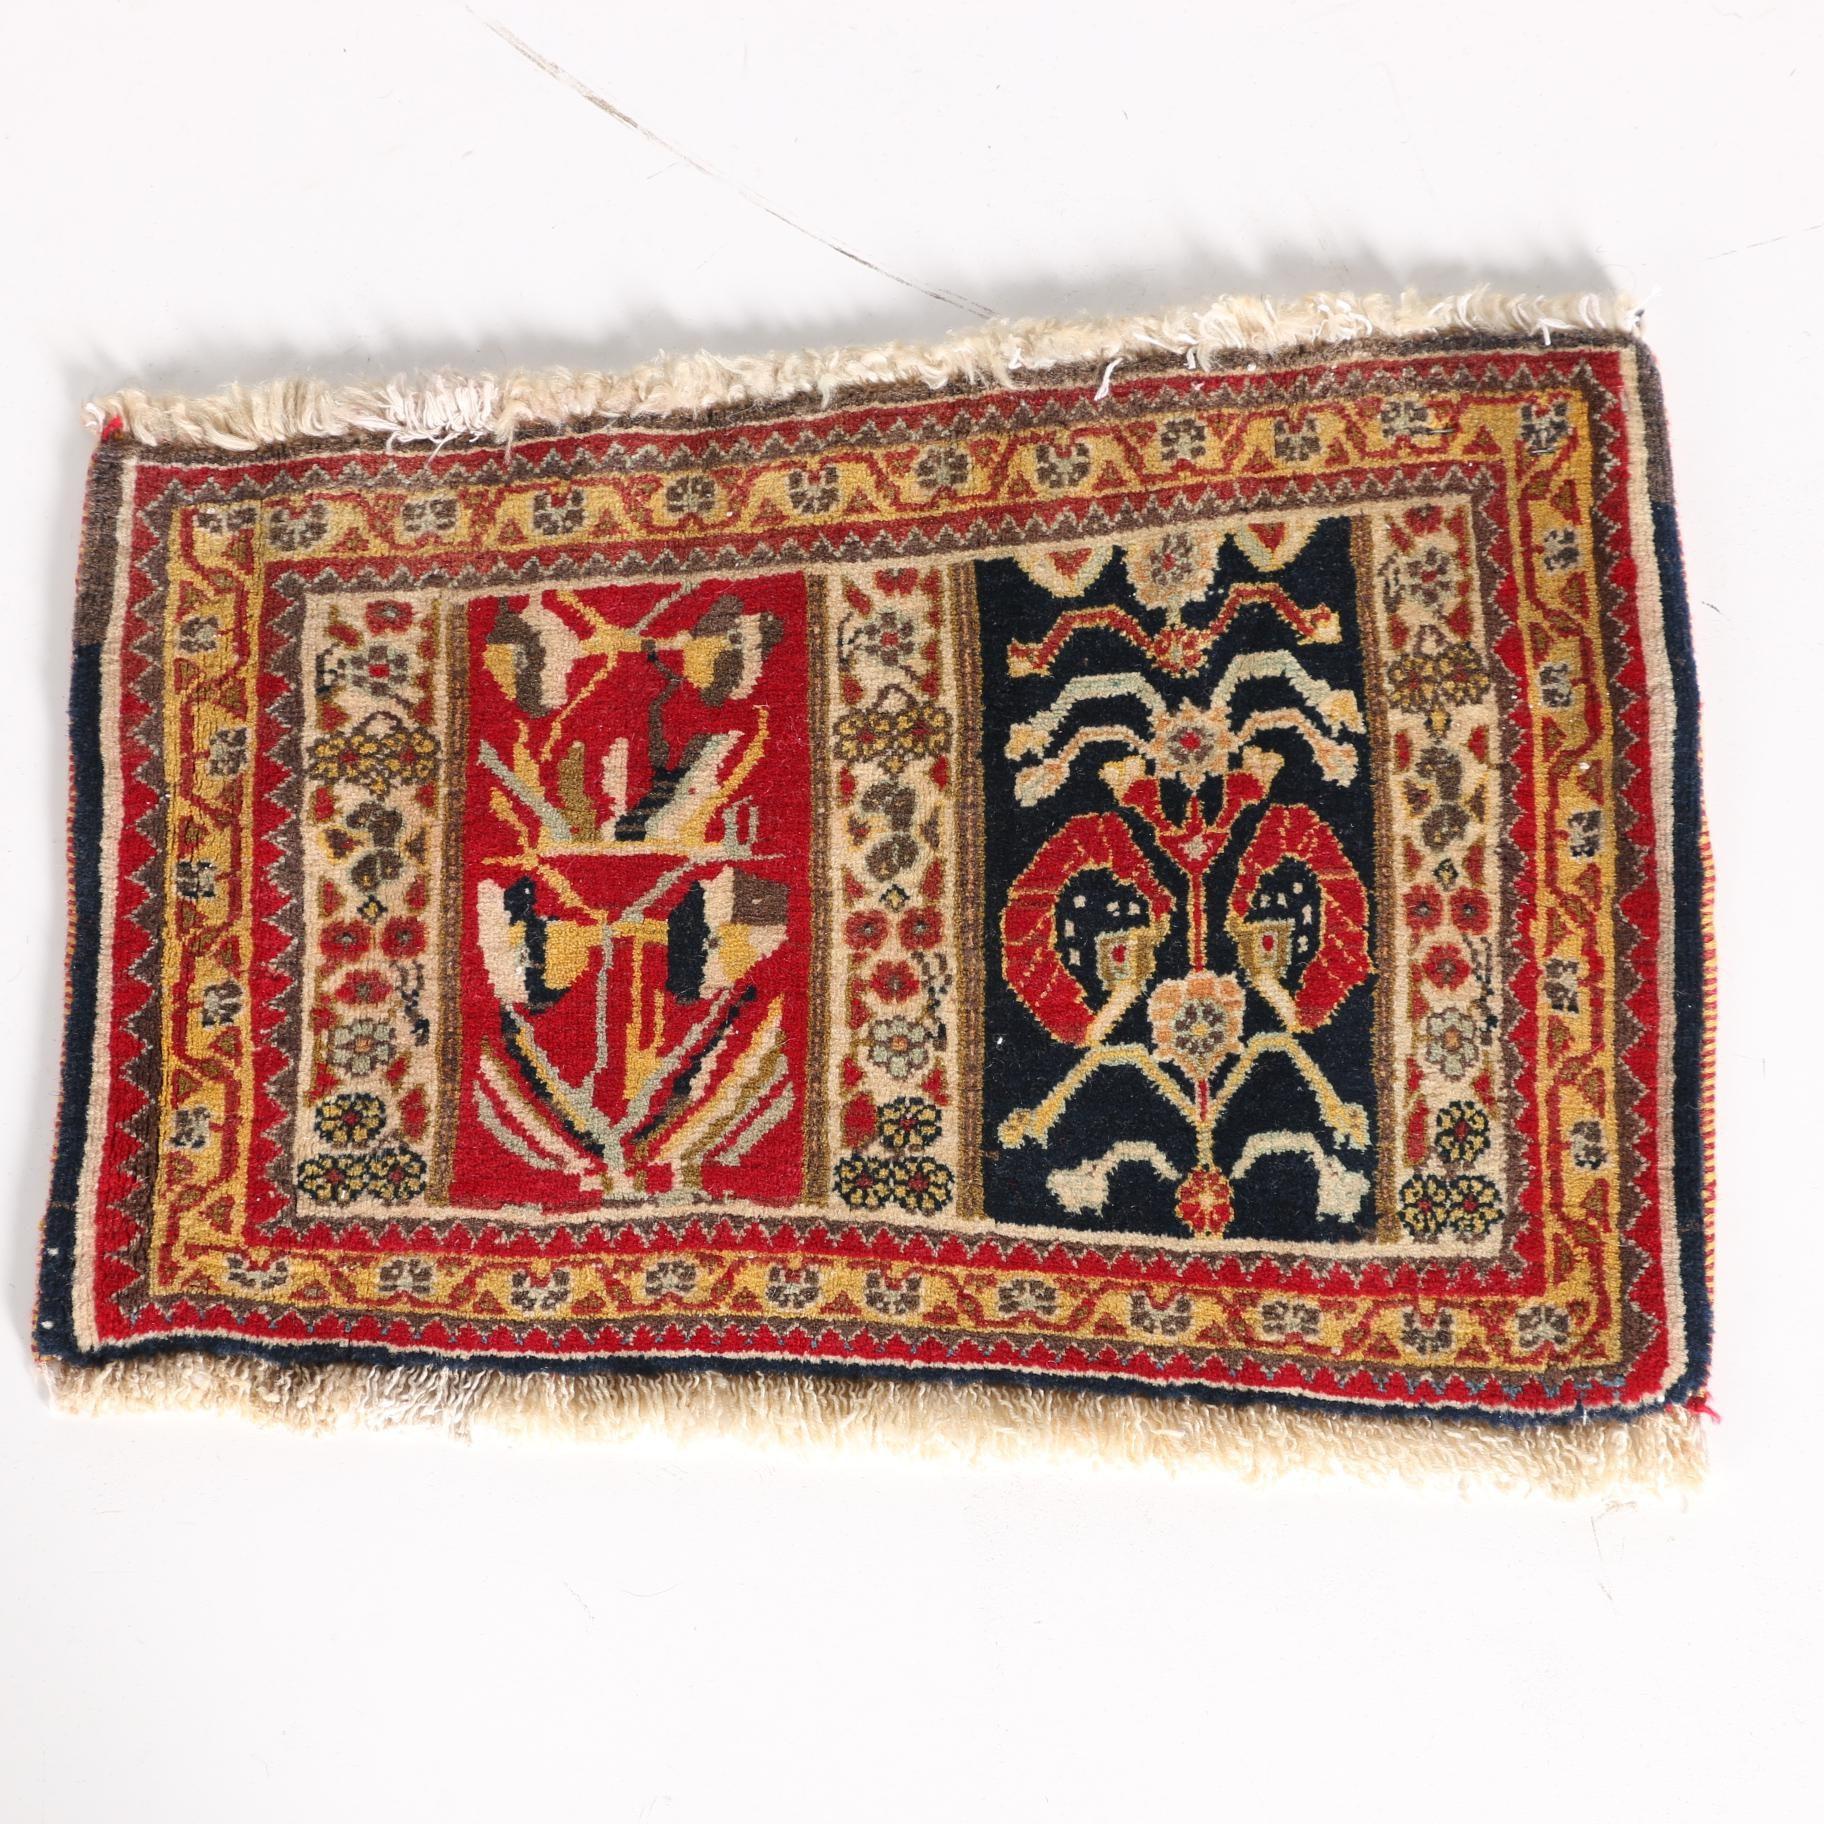 Hand-Knotted Persian Bakhtiari Style Mat